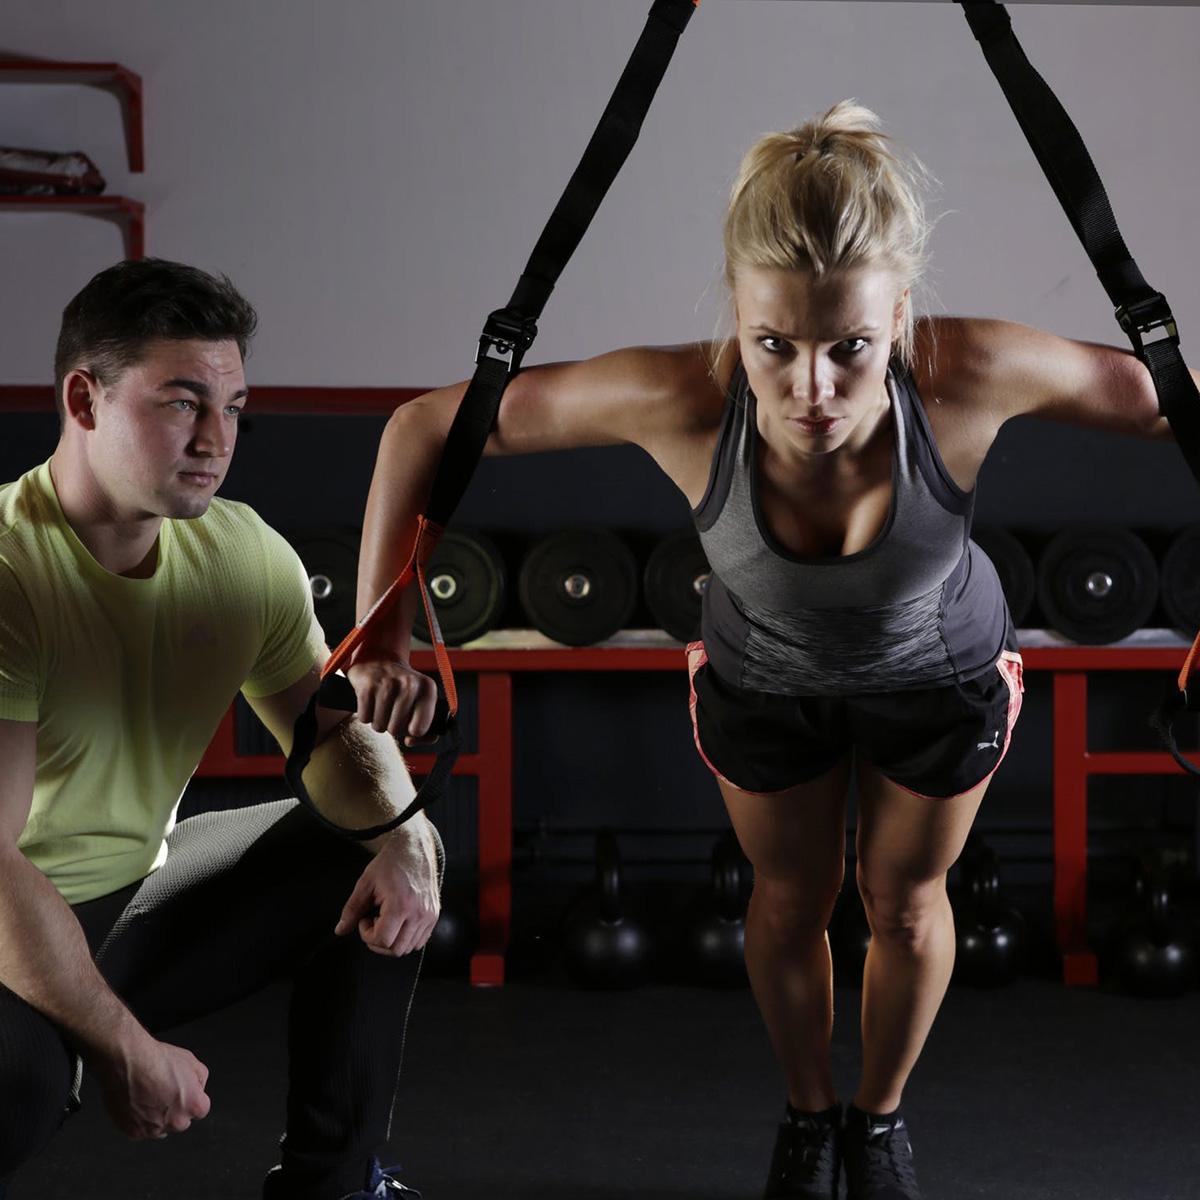 Motionsmaskiner og fitnessmaskiner